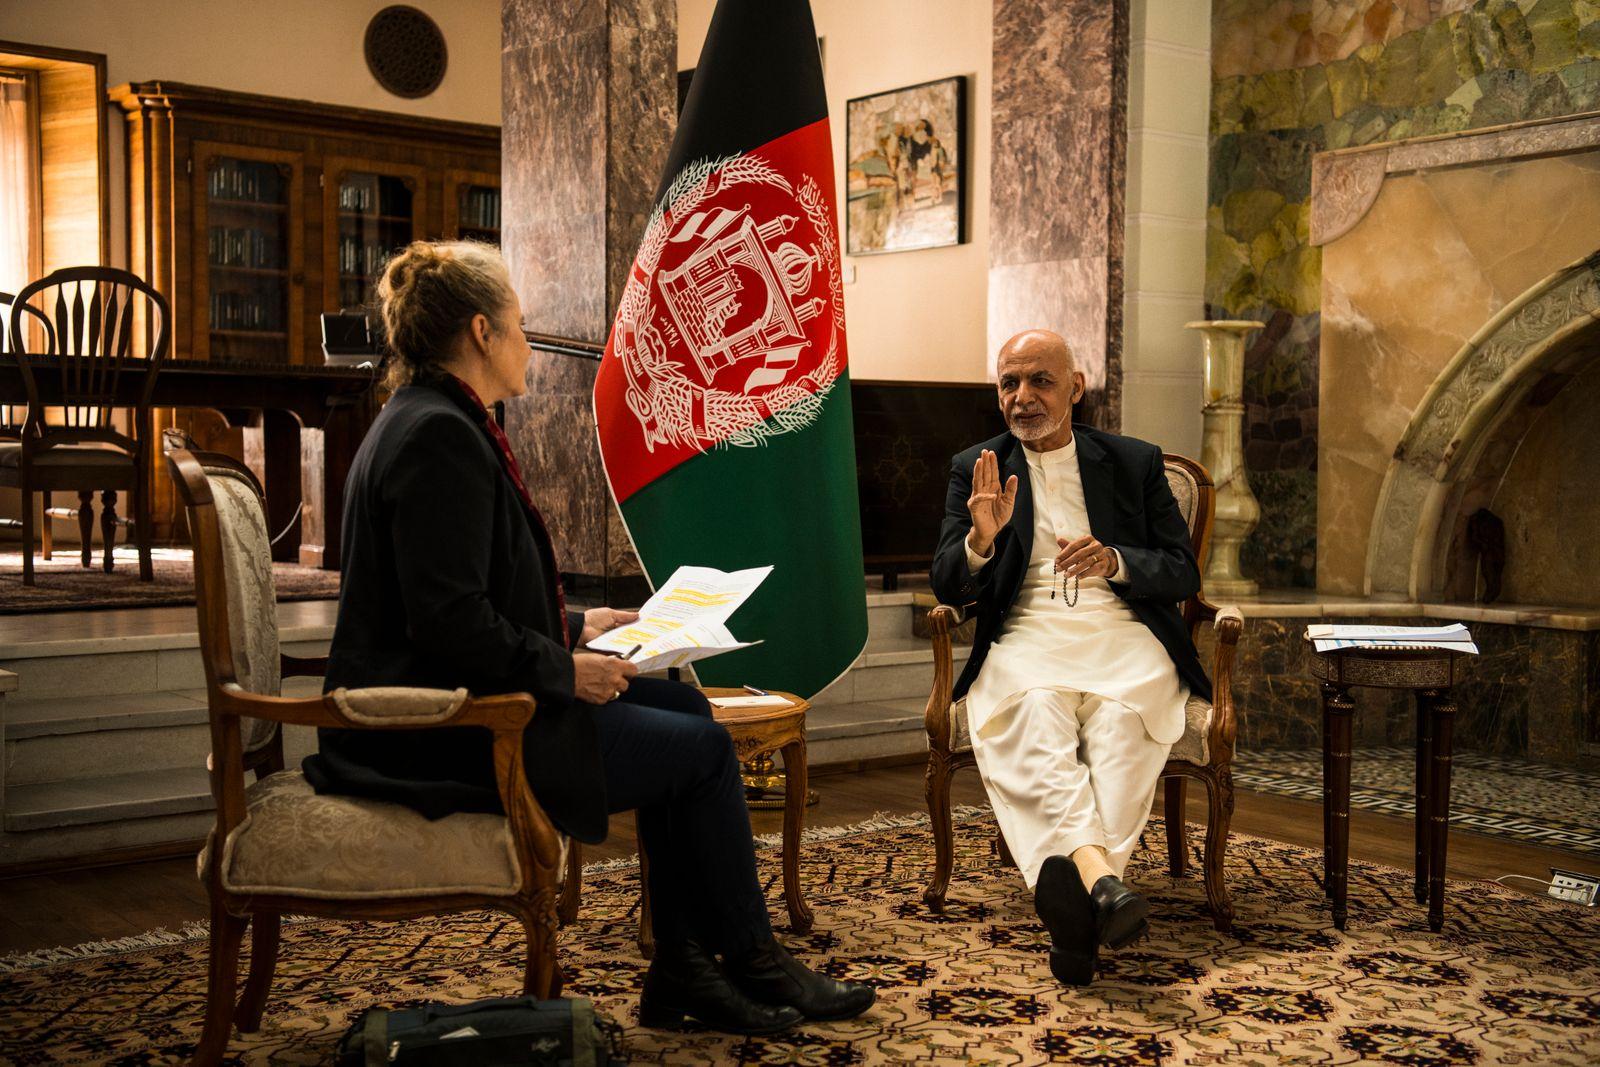 20210511_AJQ_Kabul_Afg_054-Edit.JPG